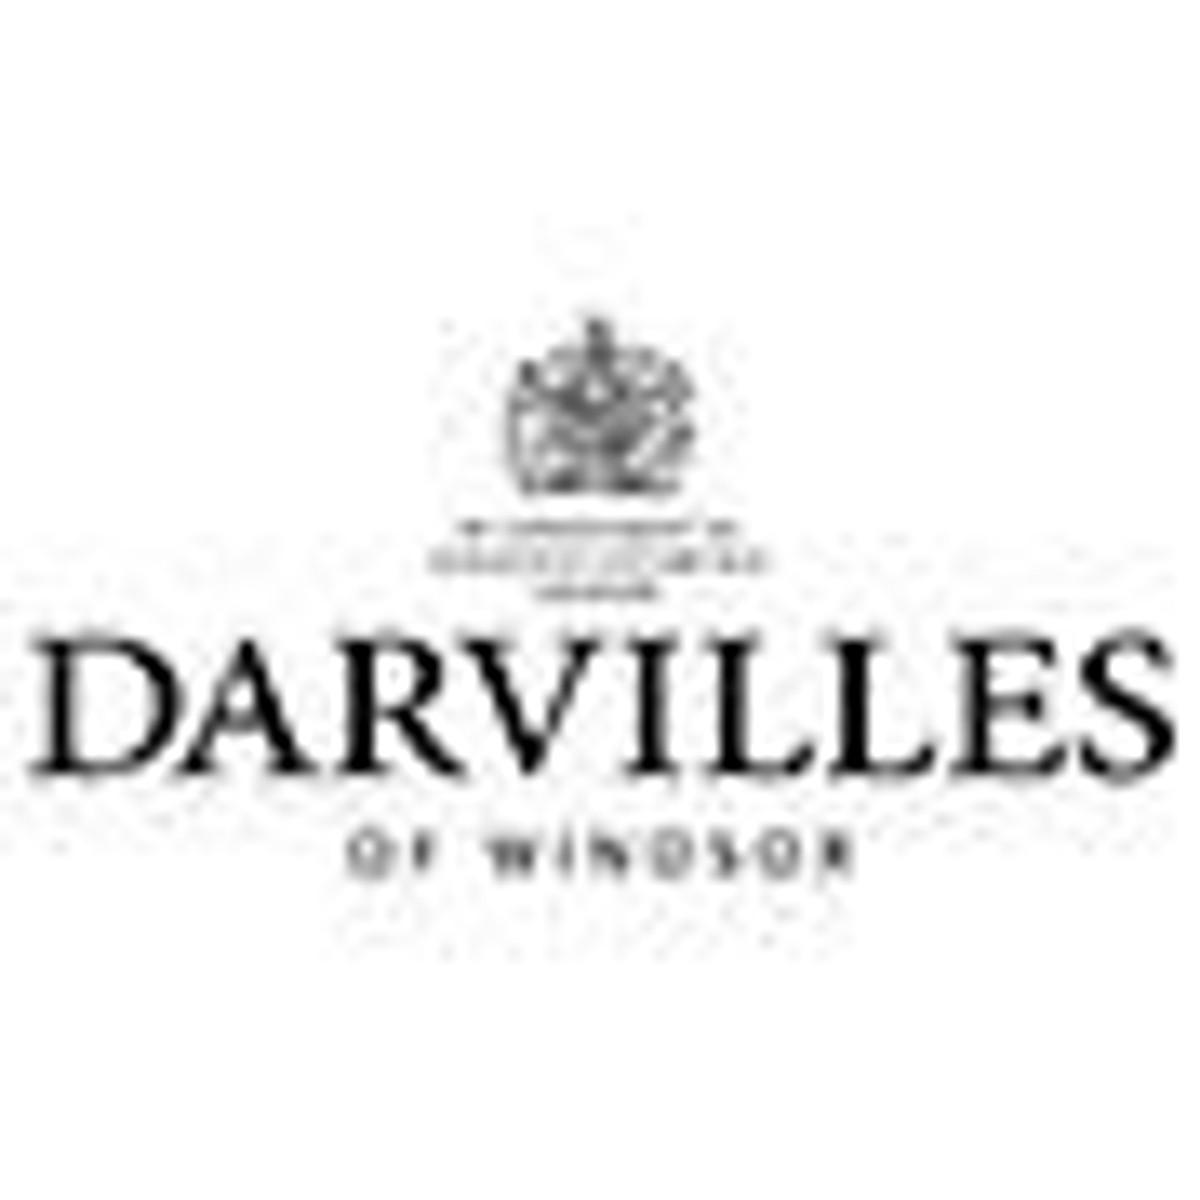 Darville's of Windsor Tea